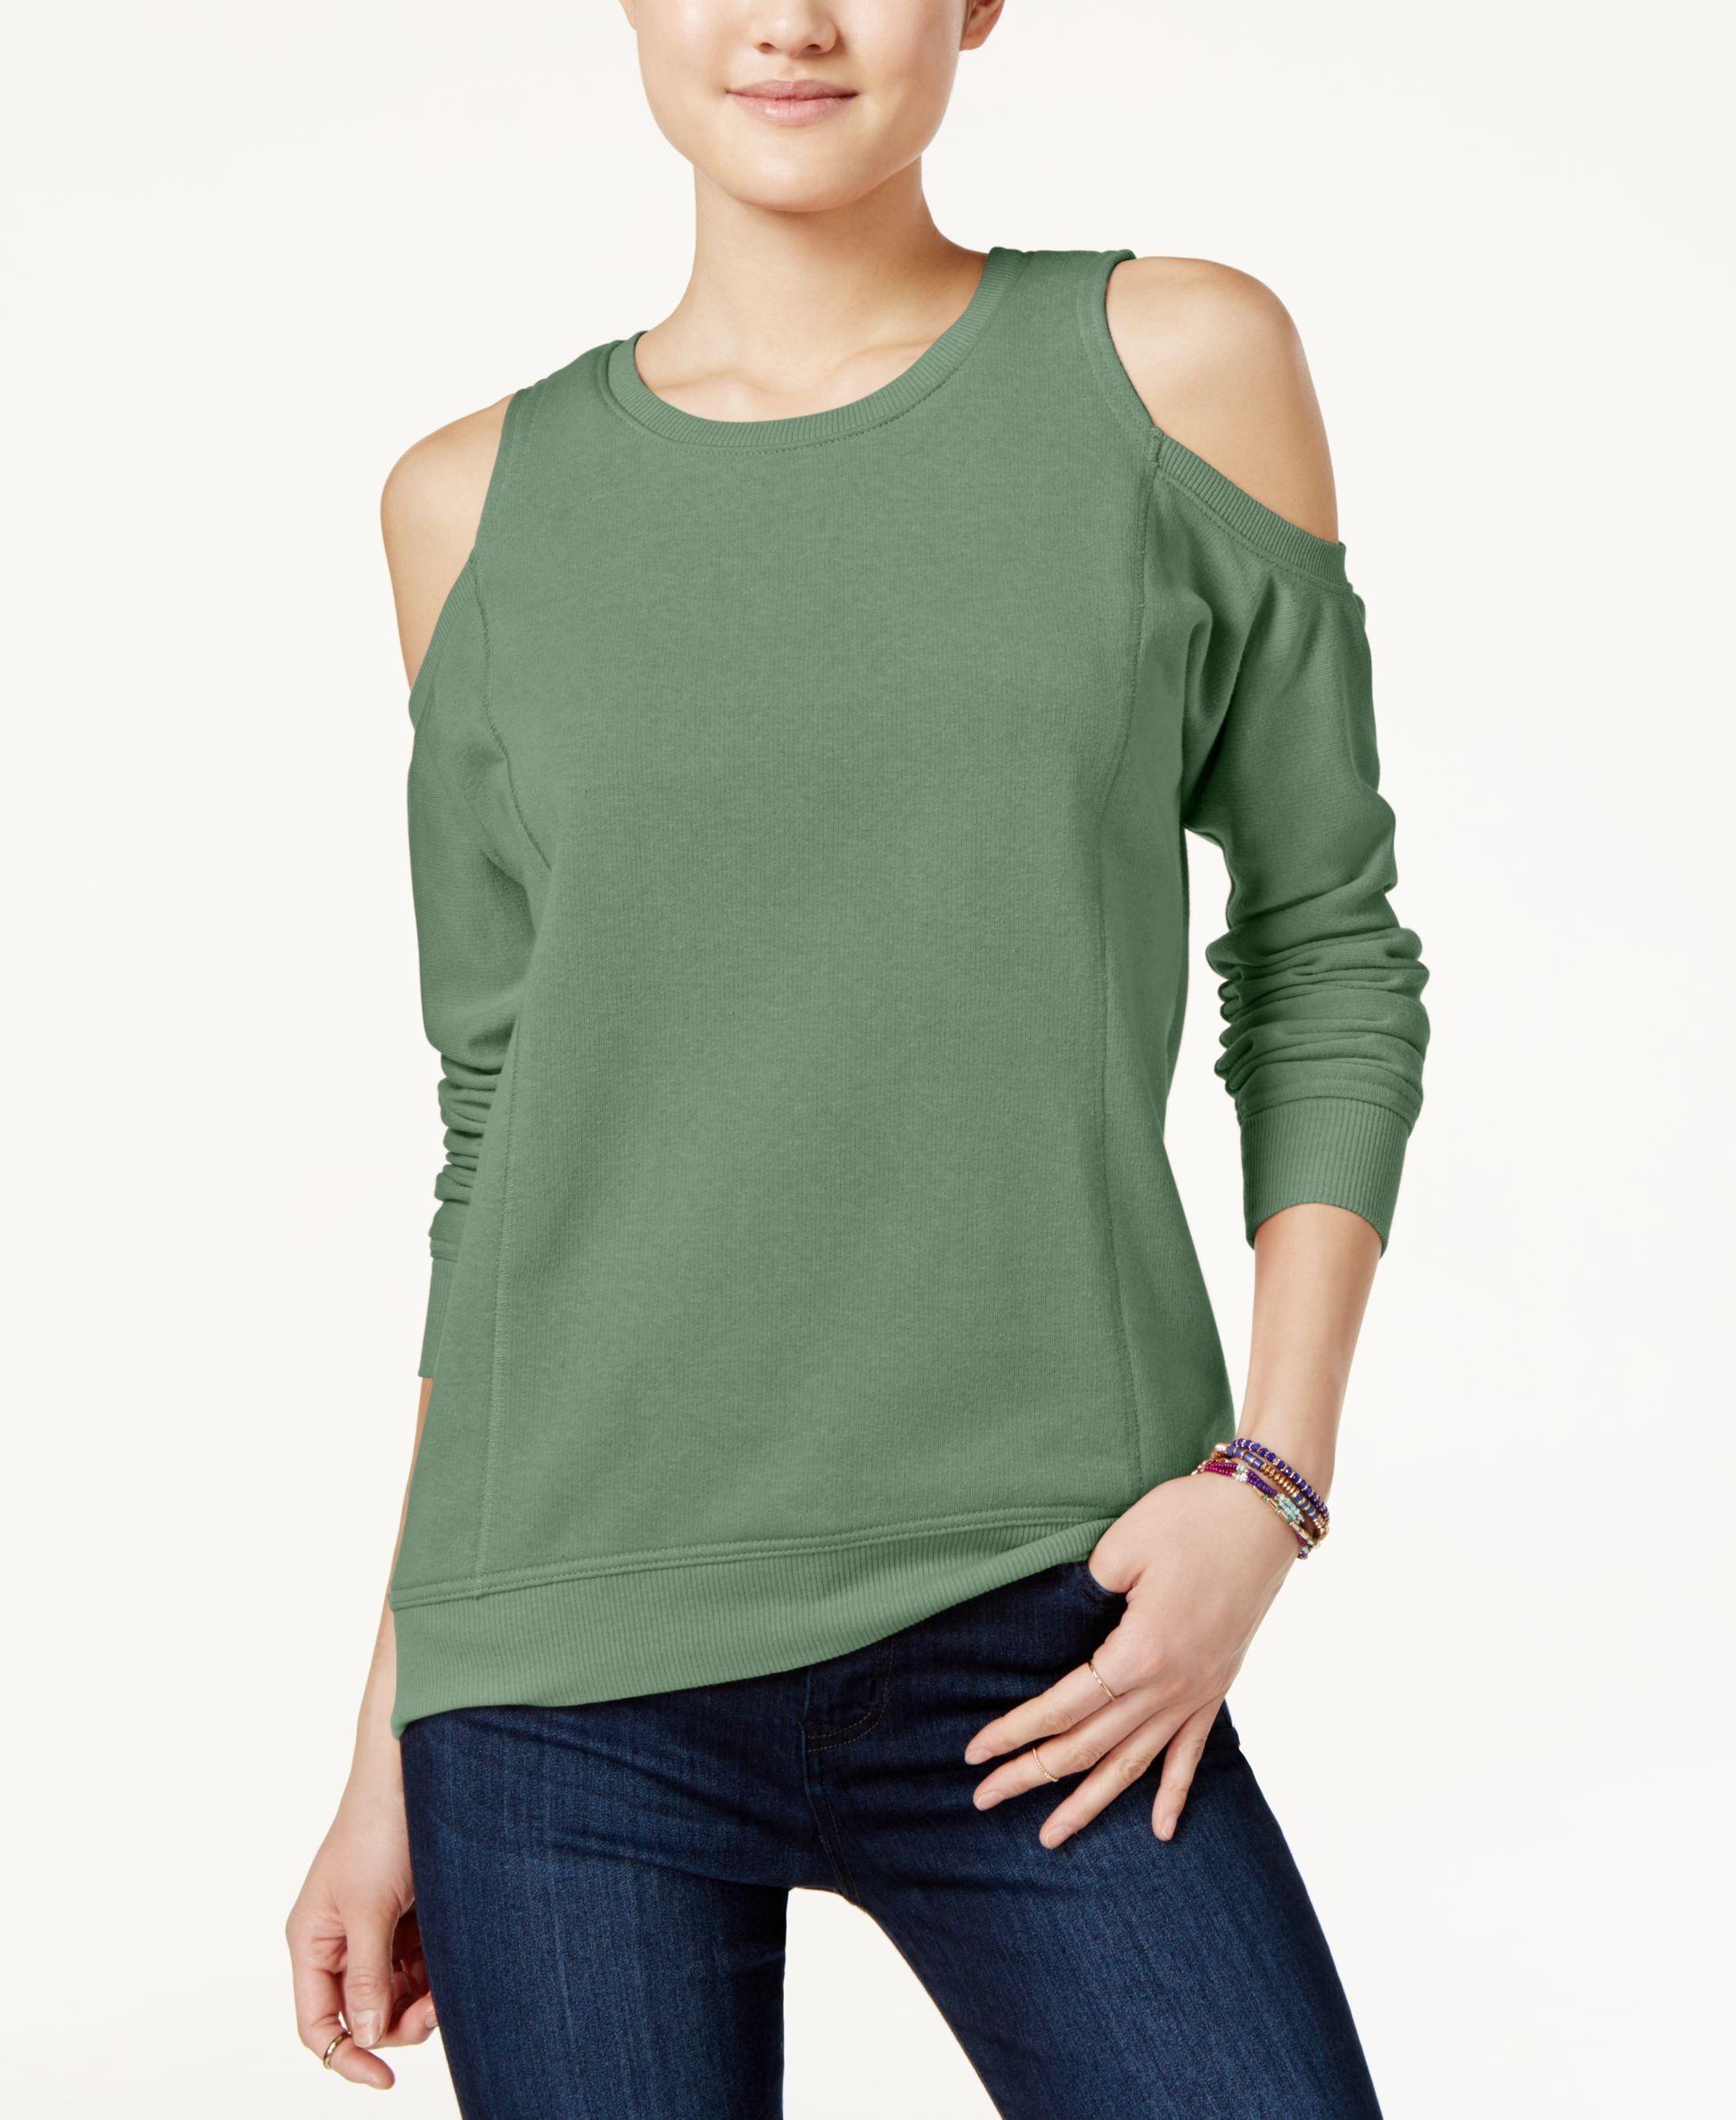 Ultra Flirt Juniors Cold-Shoulder Sweatshirt